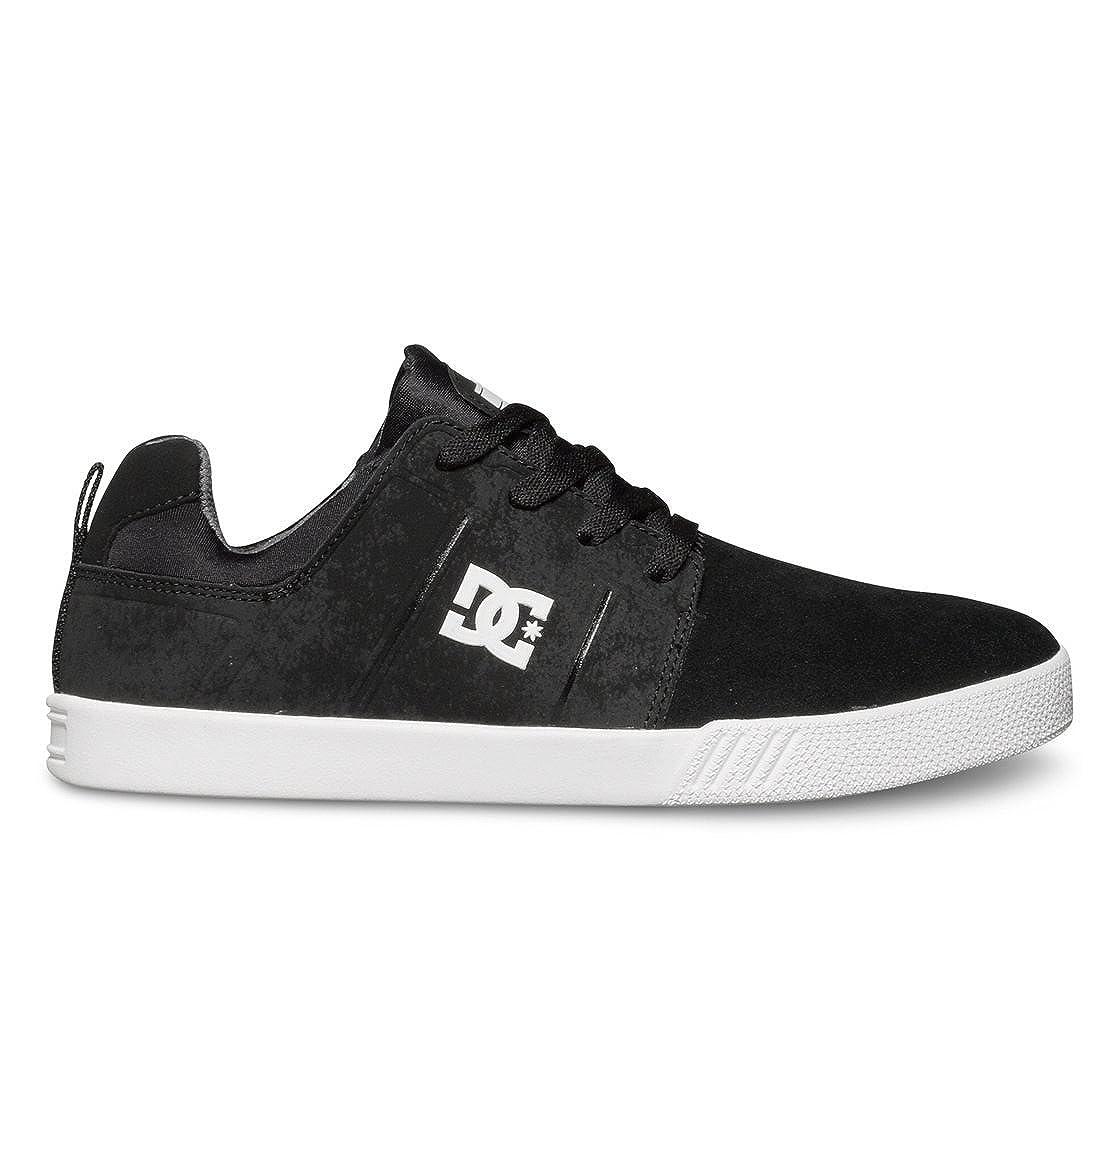 DC Skateboard Shoes ROB DYRDEK JAG BLACK//GRAY//YELLOW